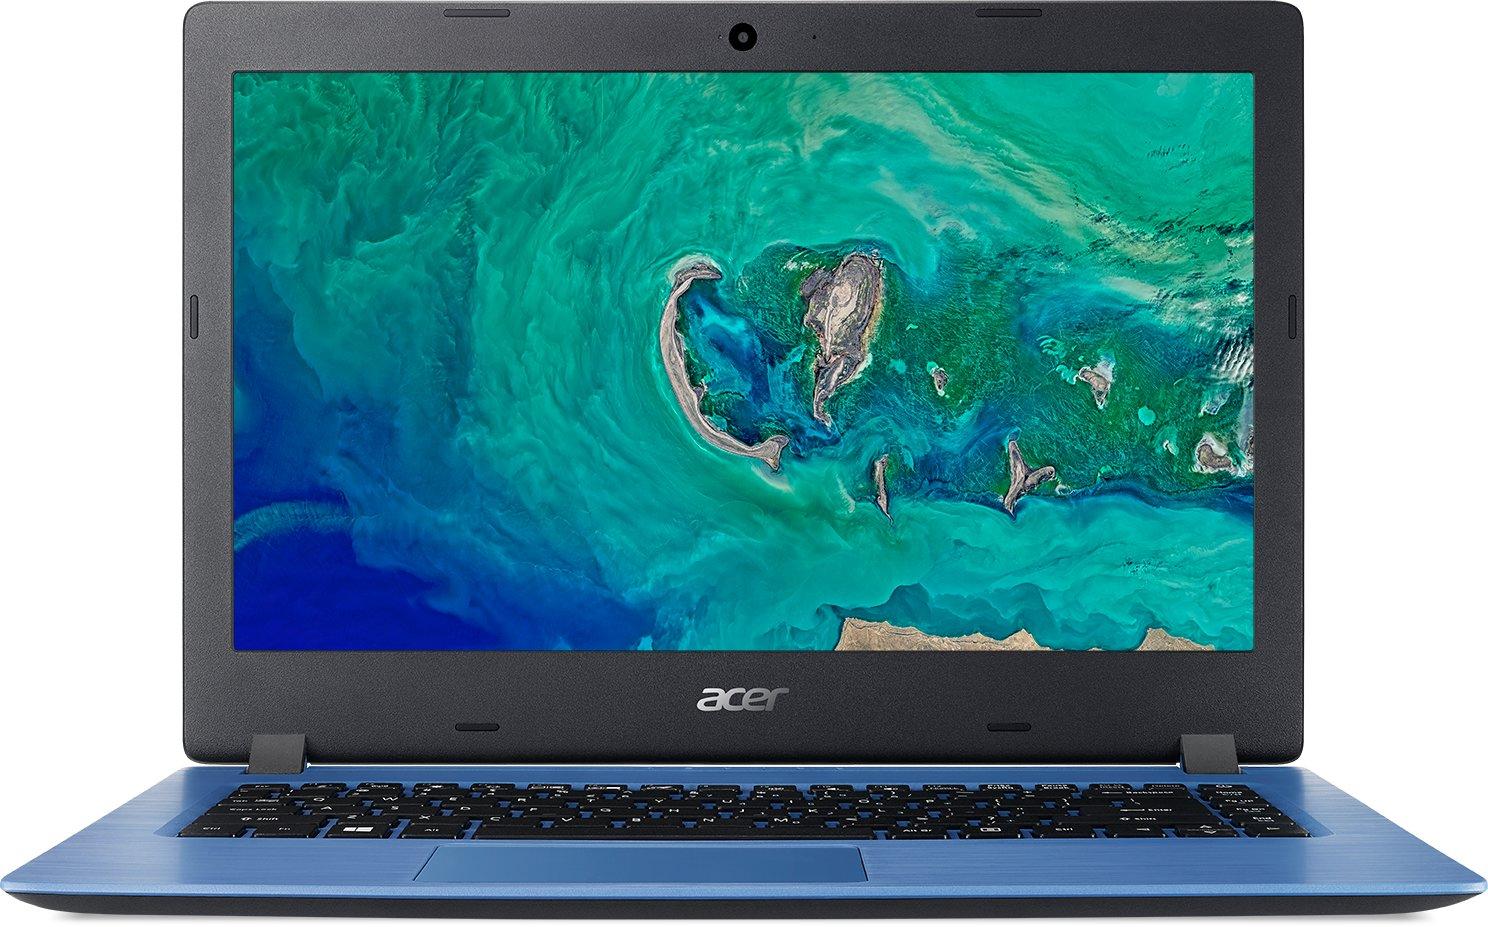 Acer Aspire 1 - 14''/N4100/4G/64GB/W10S modrý + Office 365 Personal